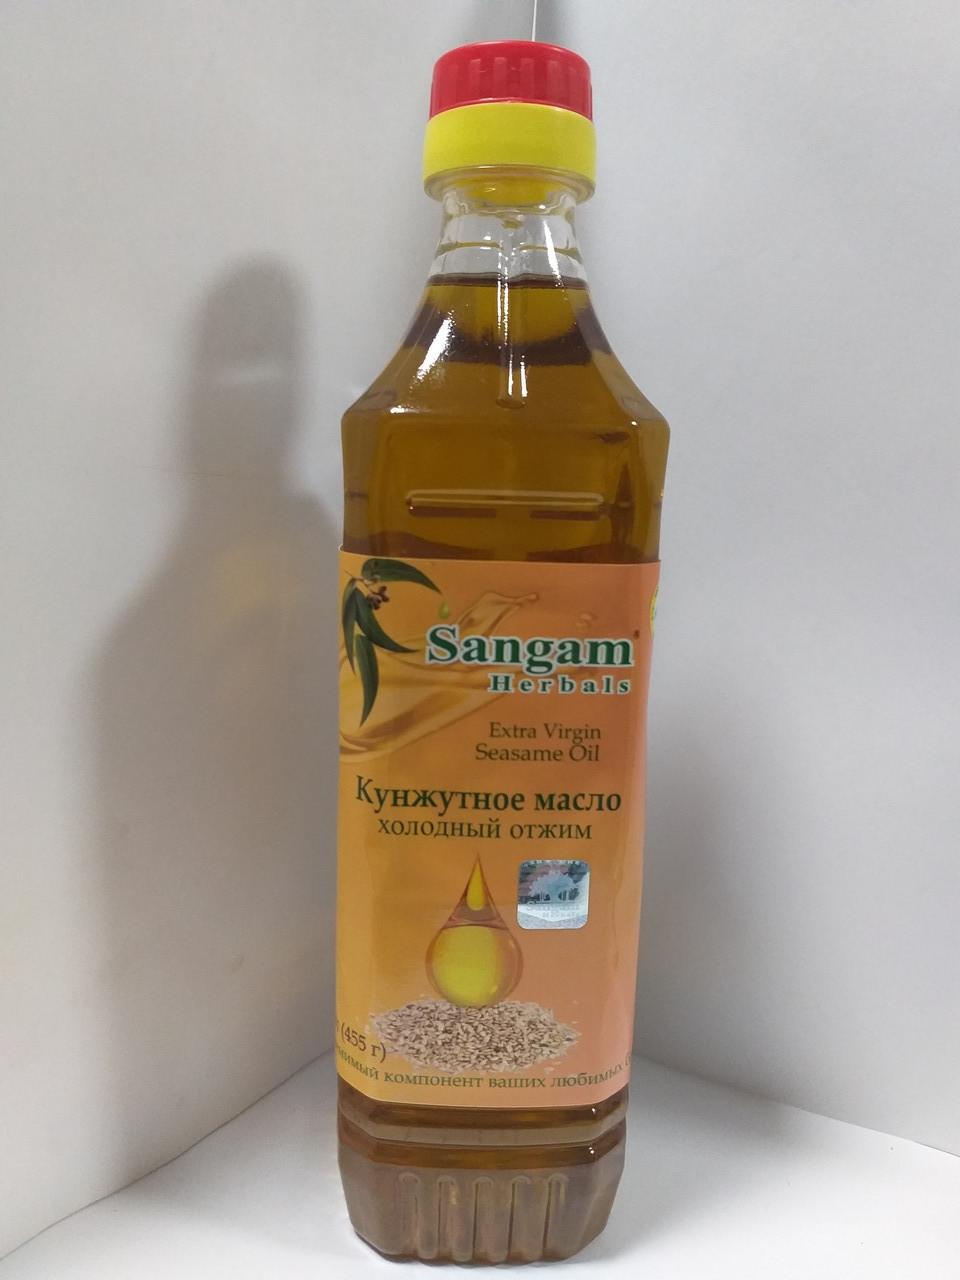 Кунжутное масло, 500 мл, Сангам, Extra Virgin Seasame Oil